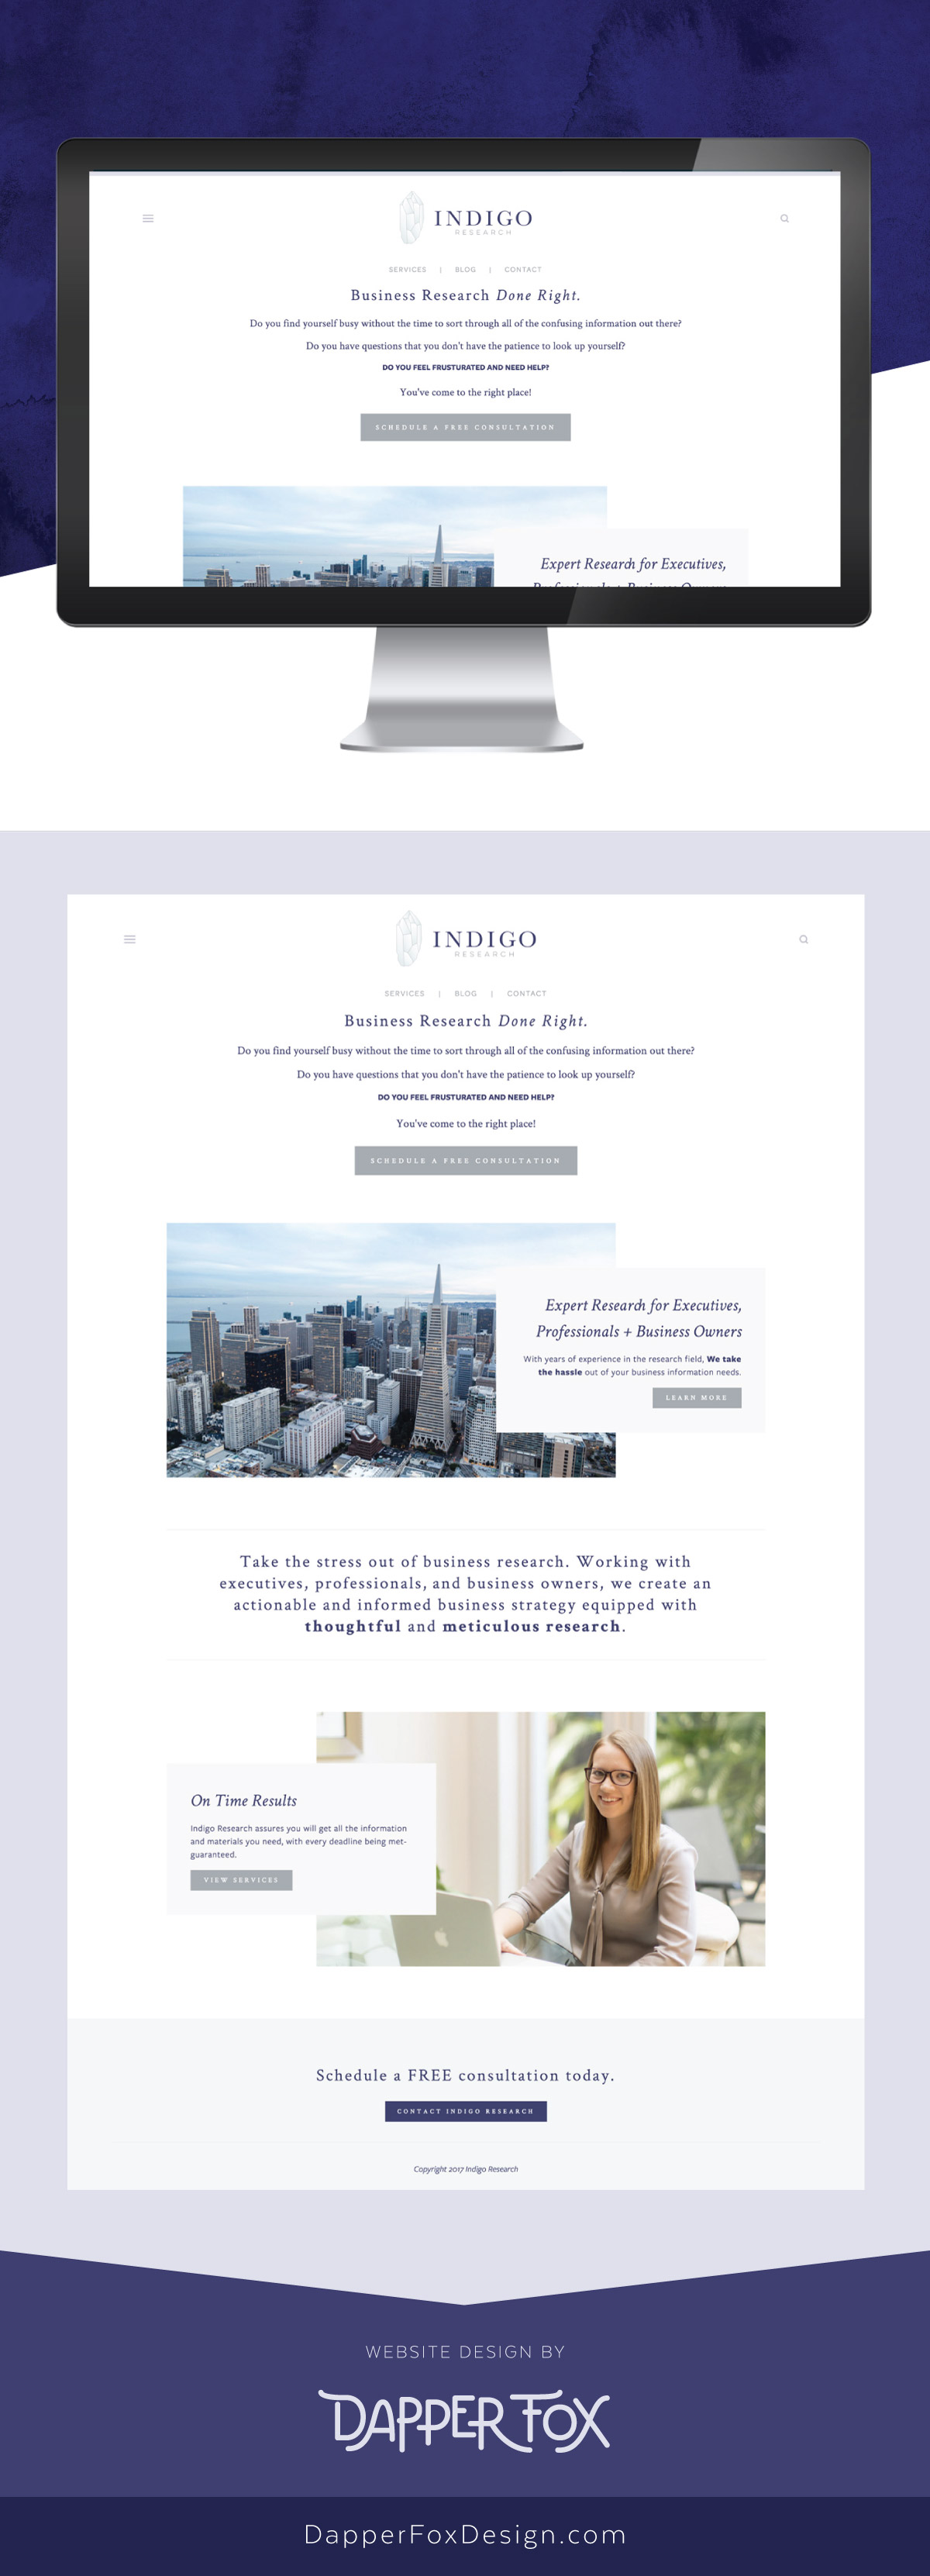 Squarespace Website Design - Indigo Research Florida Squarespace Website Design and Branding by Dapper Fox Design